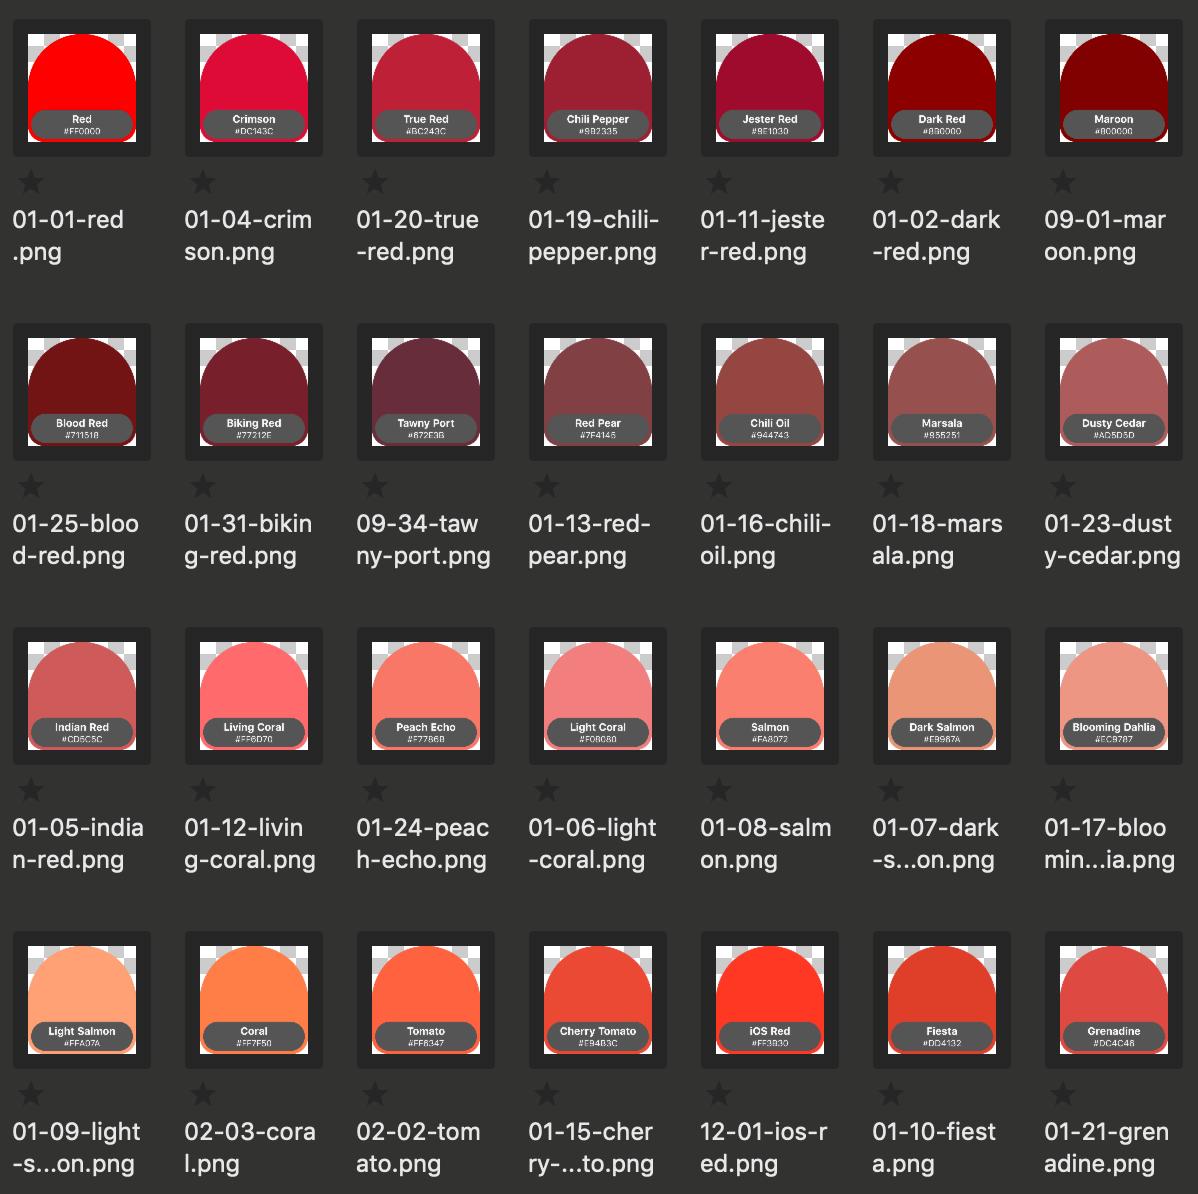 Sorting reds